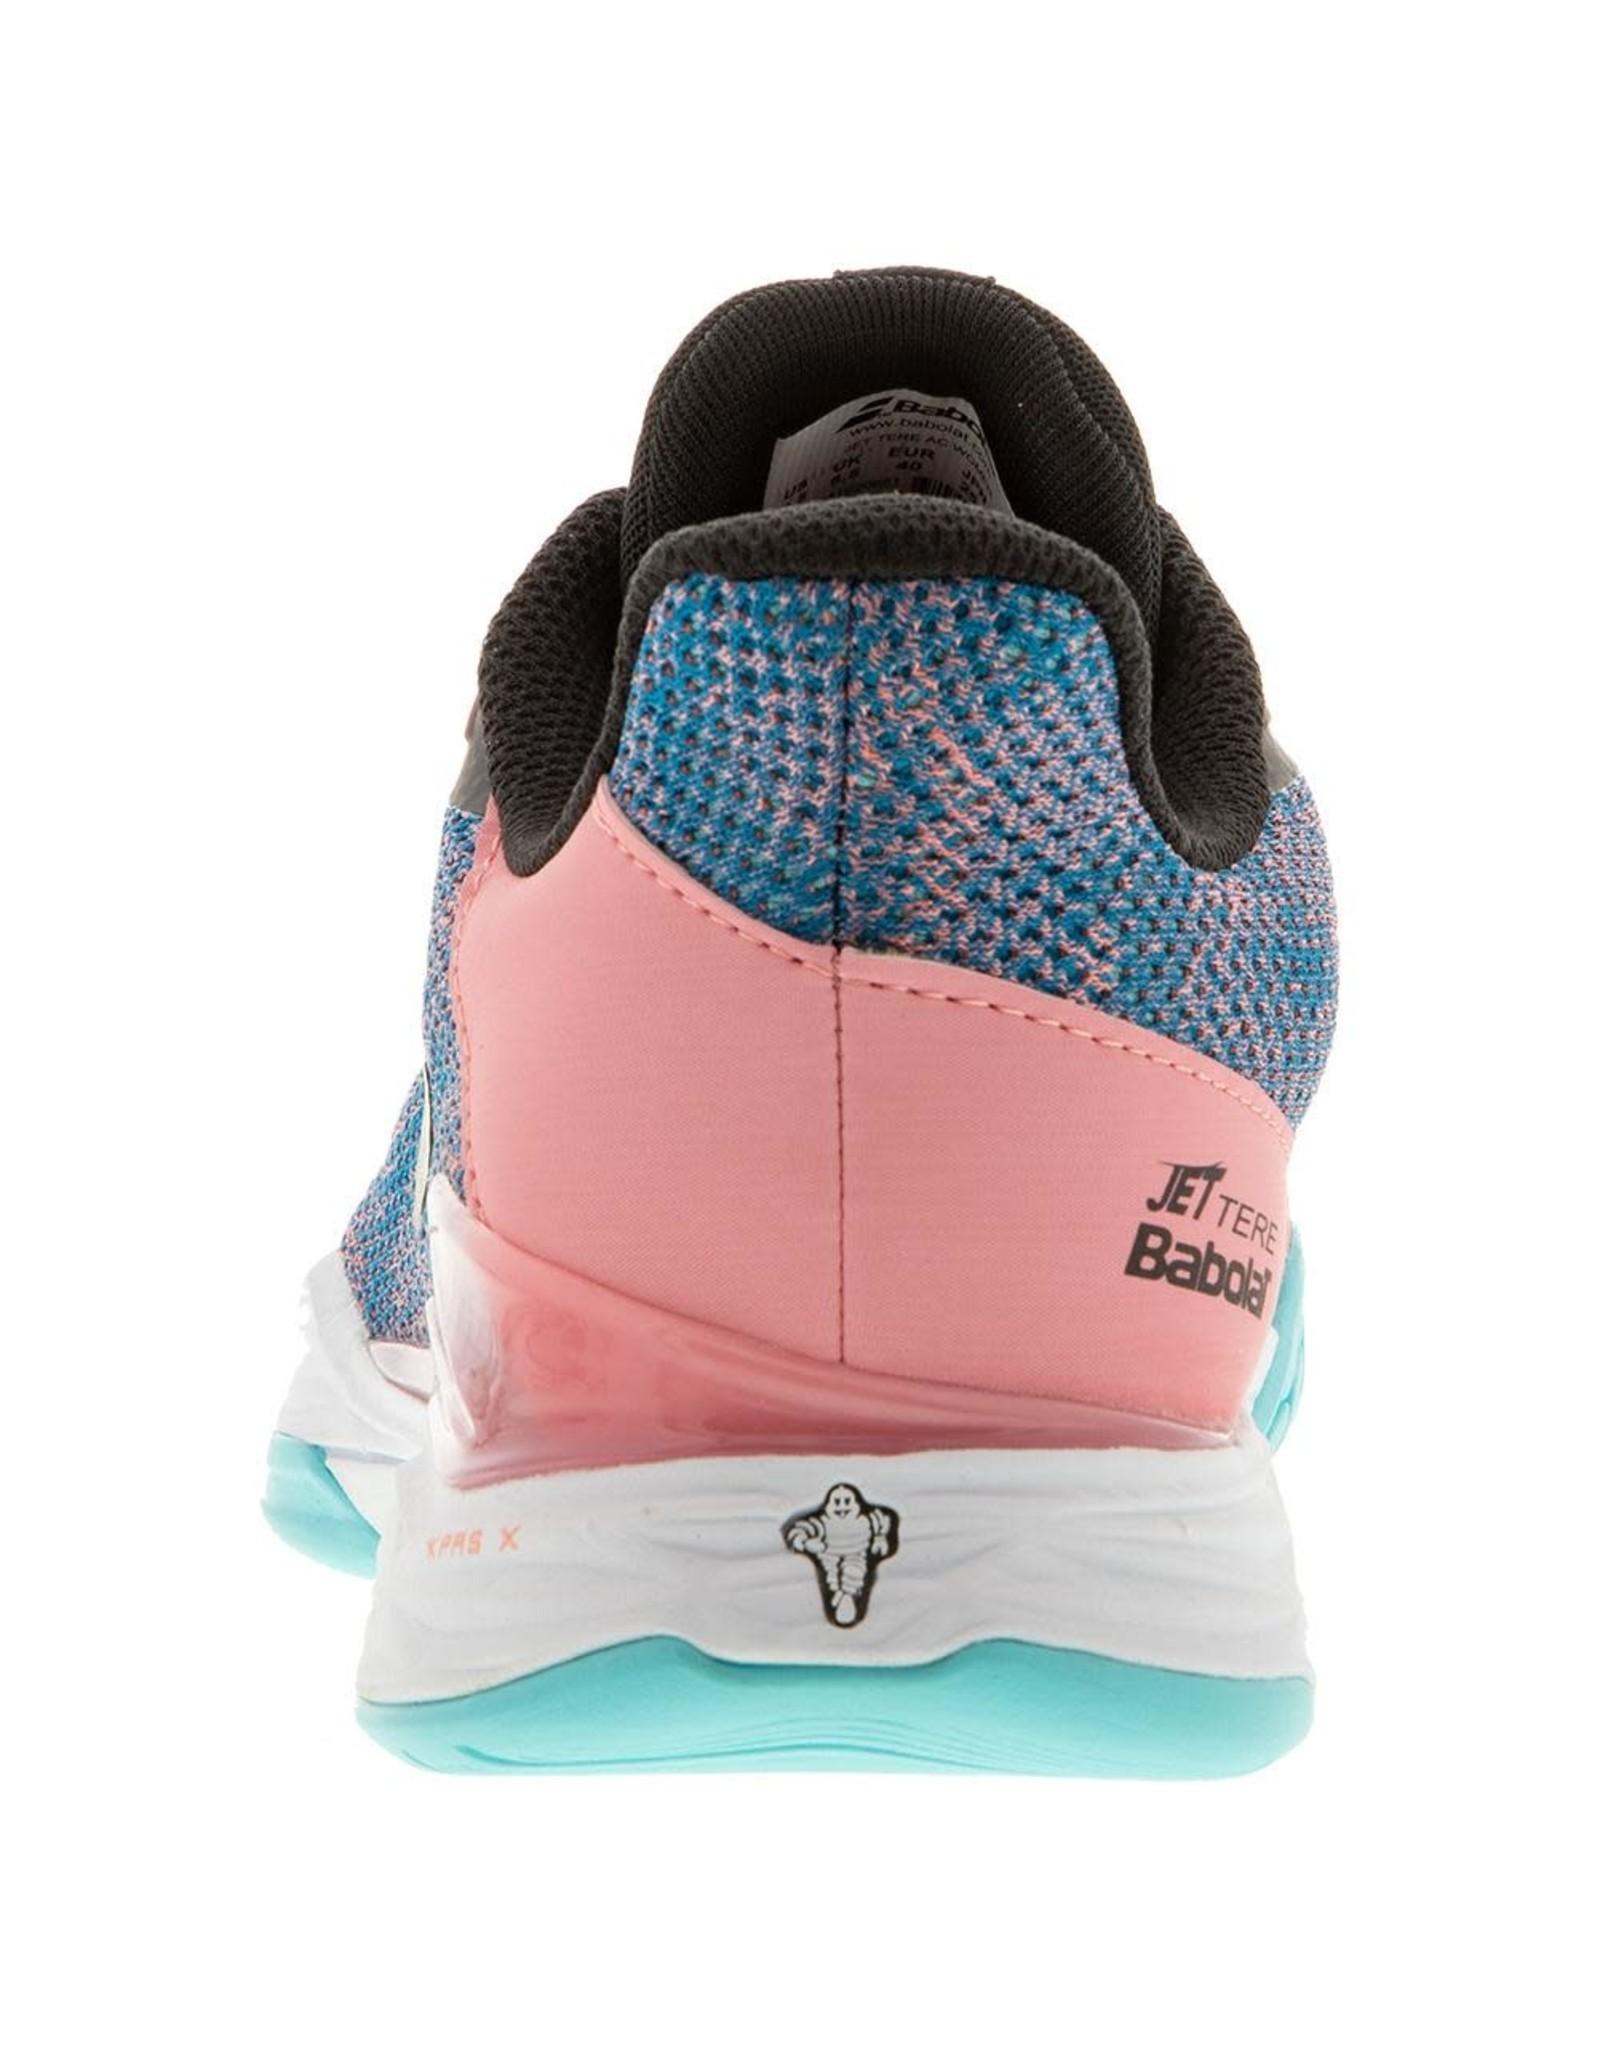 Babolat Babolat Jet Tere AC Women's Shoe